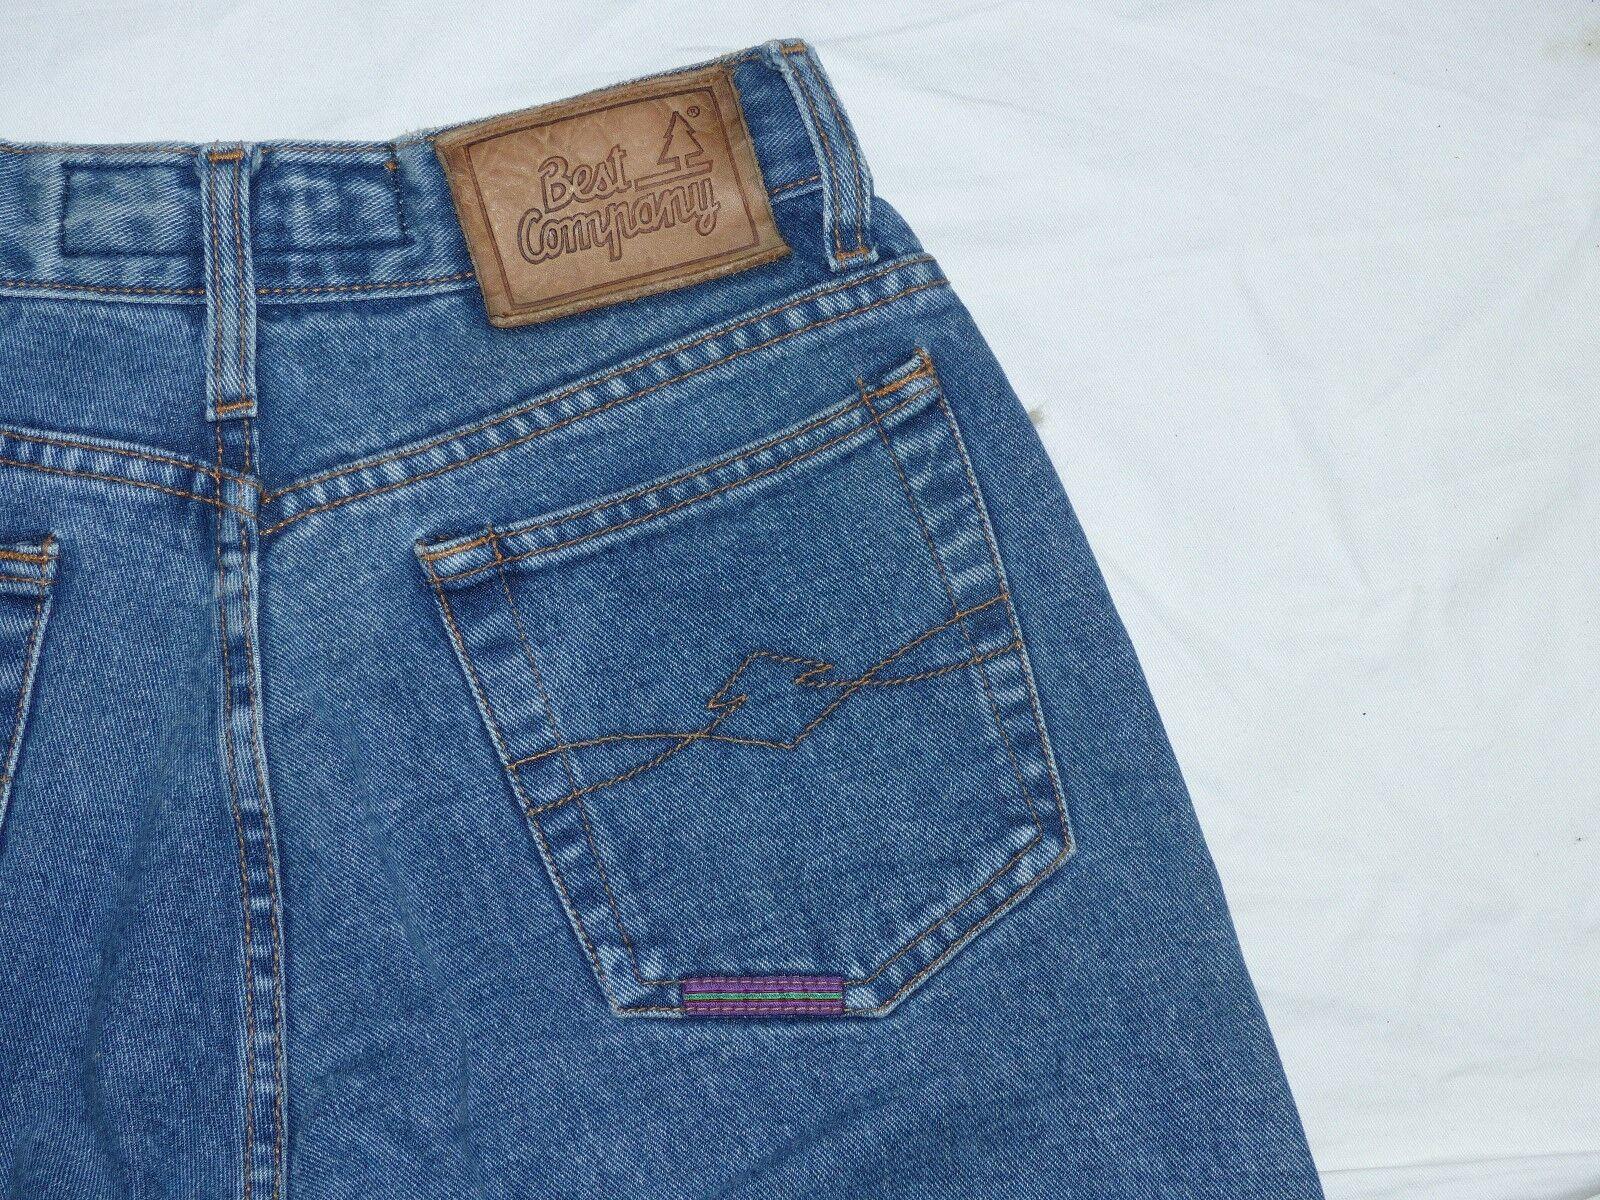 BEST COMPANY jeans pantaloni  OLMES CARRETTI  VINTAGE  Oldschool  blu  Gr  30tip Top